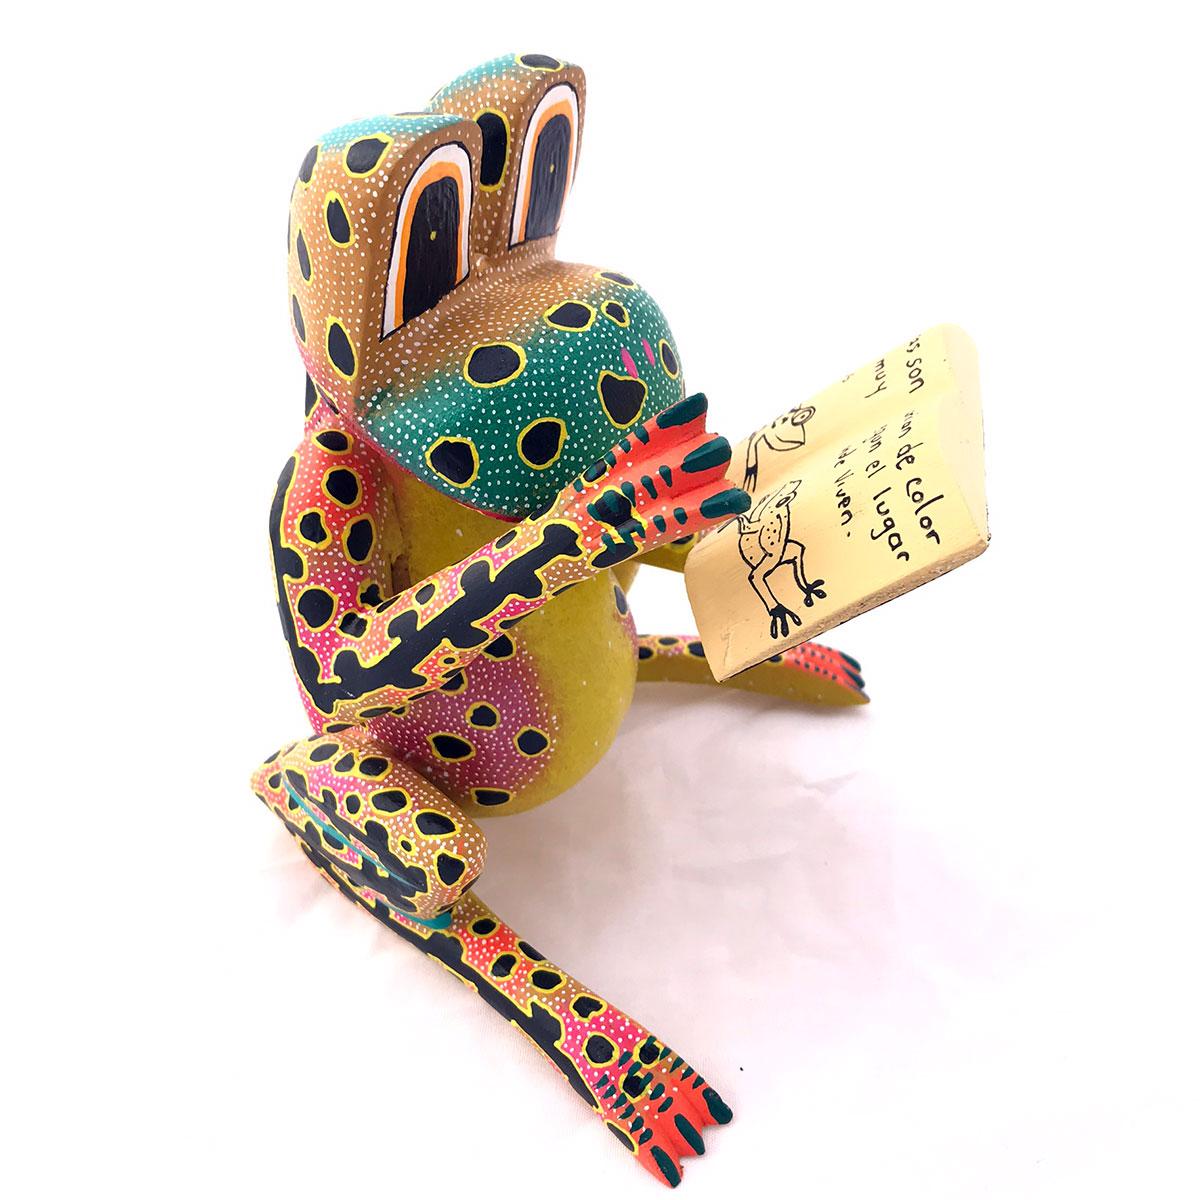 David Blas David Blas: Literary Frog Frog